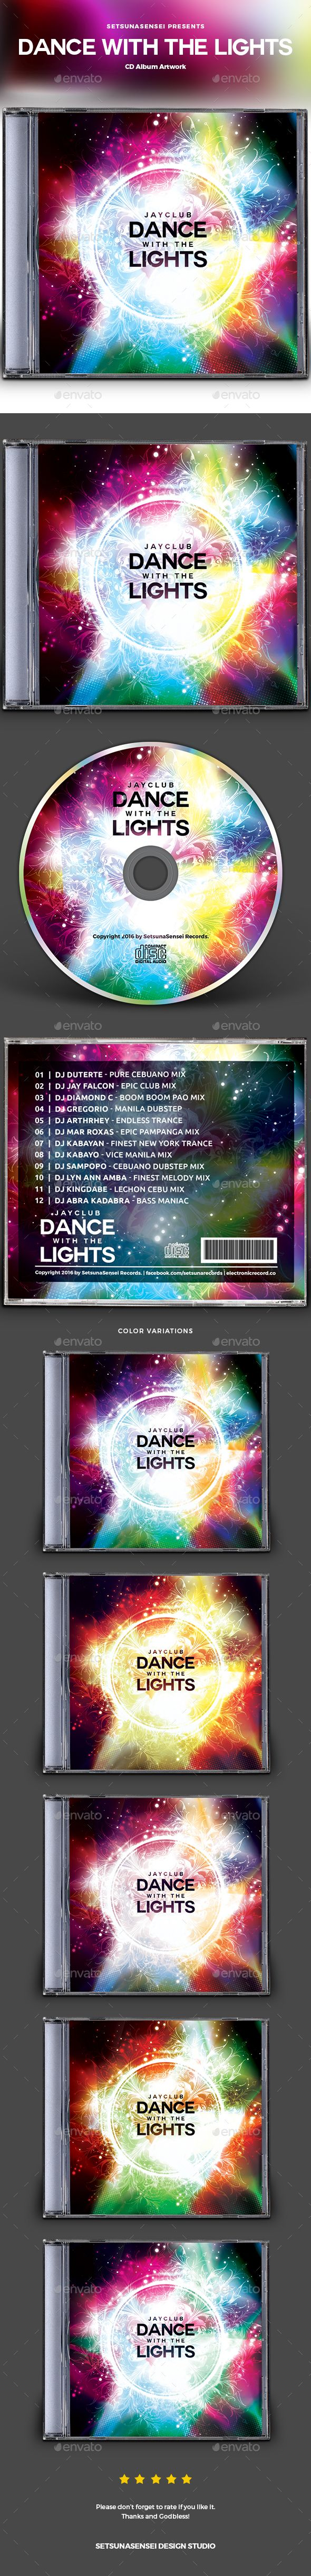 Dance with the Lights CD Album Artwork - CD & DVD Artwork Print Templates